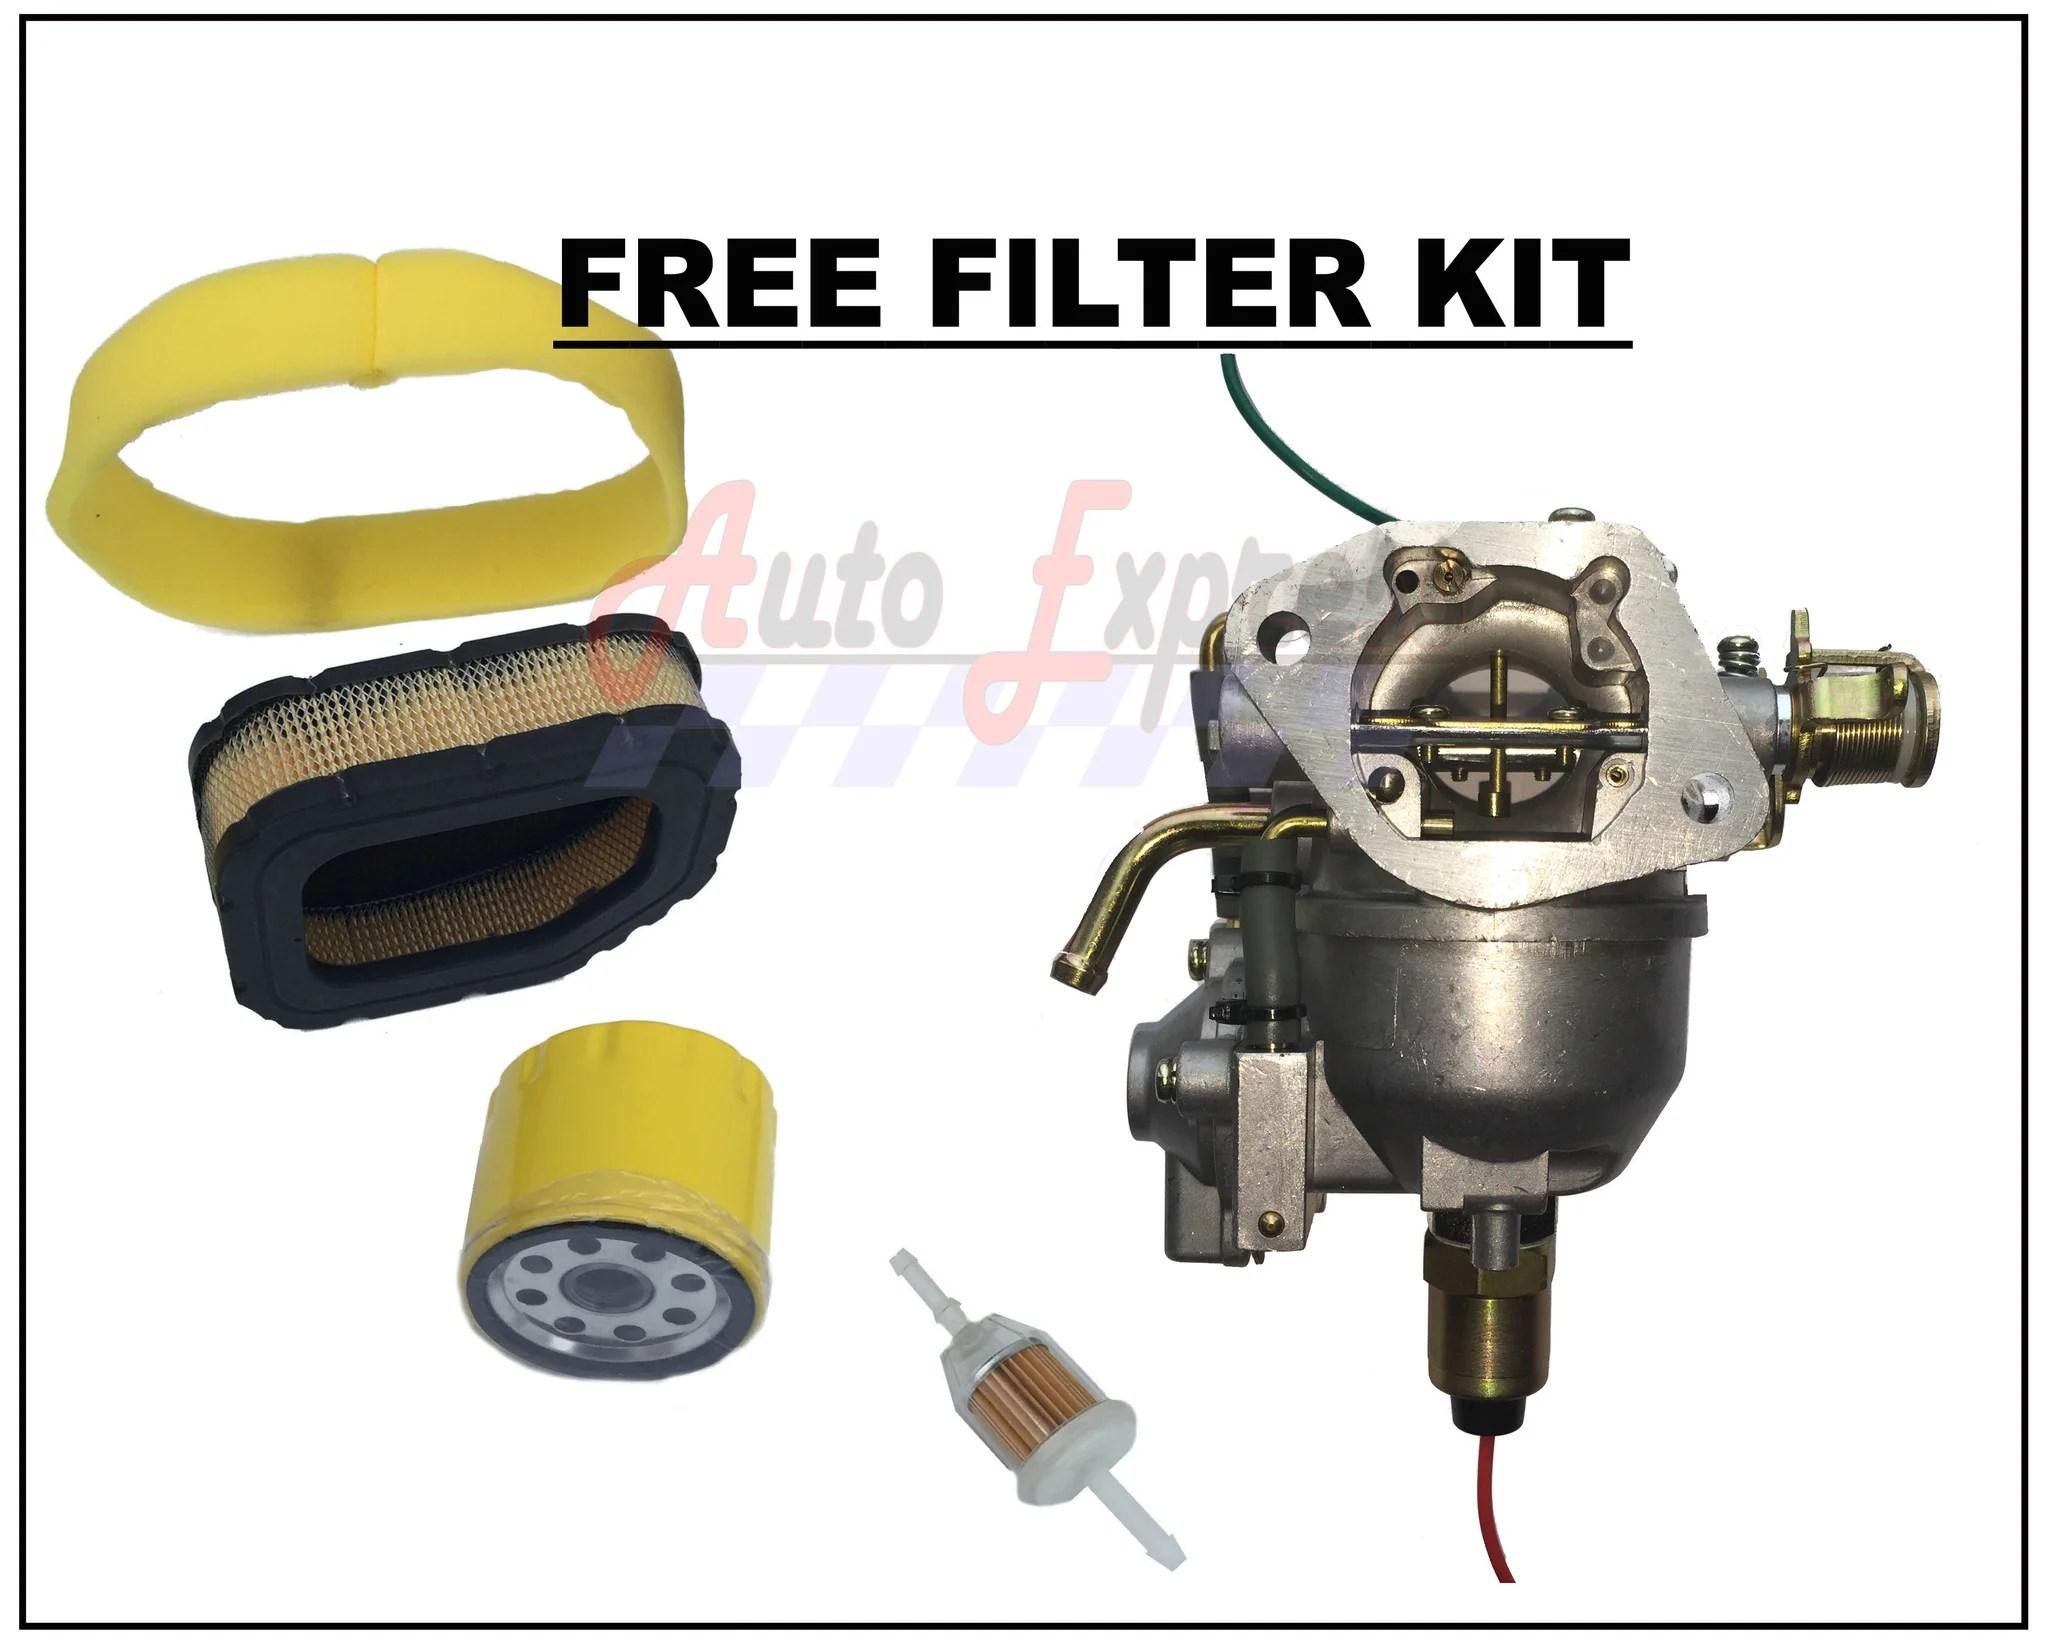 nikki carburetor fits kohler ch18 ch20 carb pump air oil fuel filters [ 2048 x 1652 Pixel ]